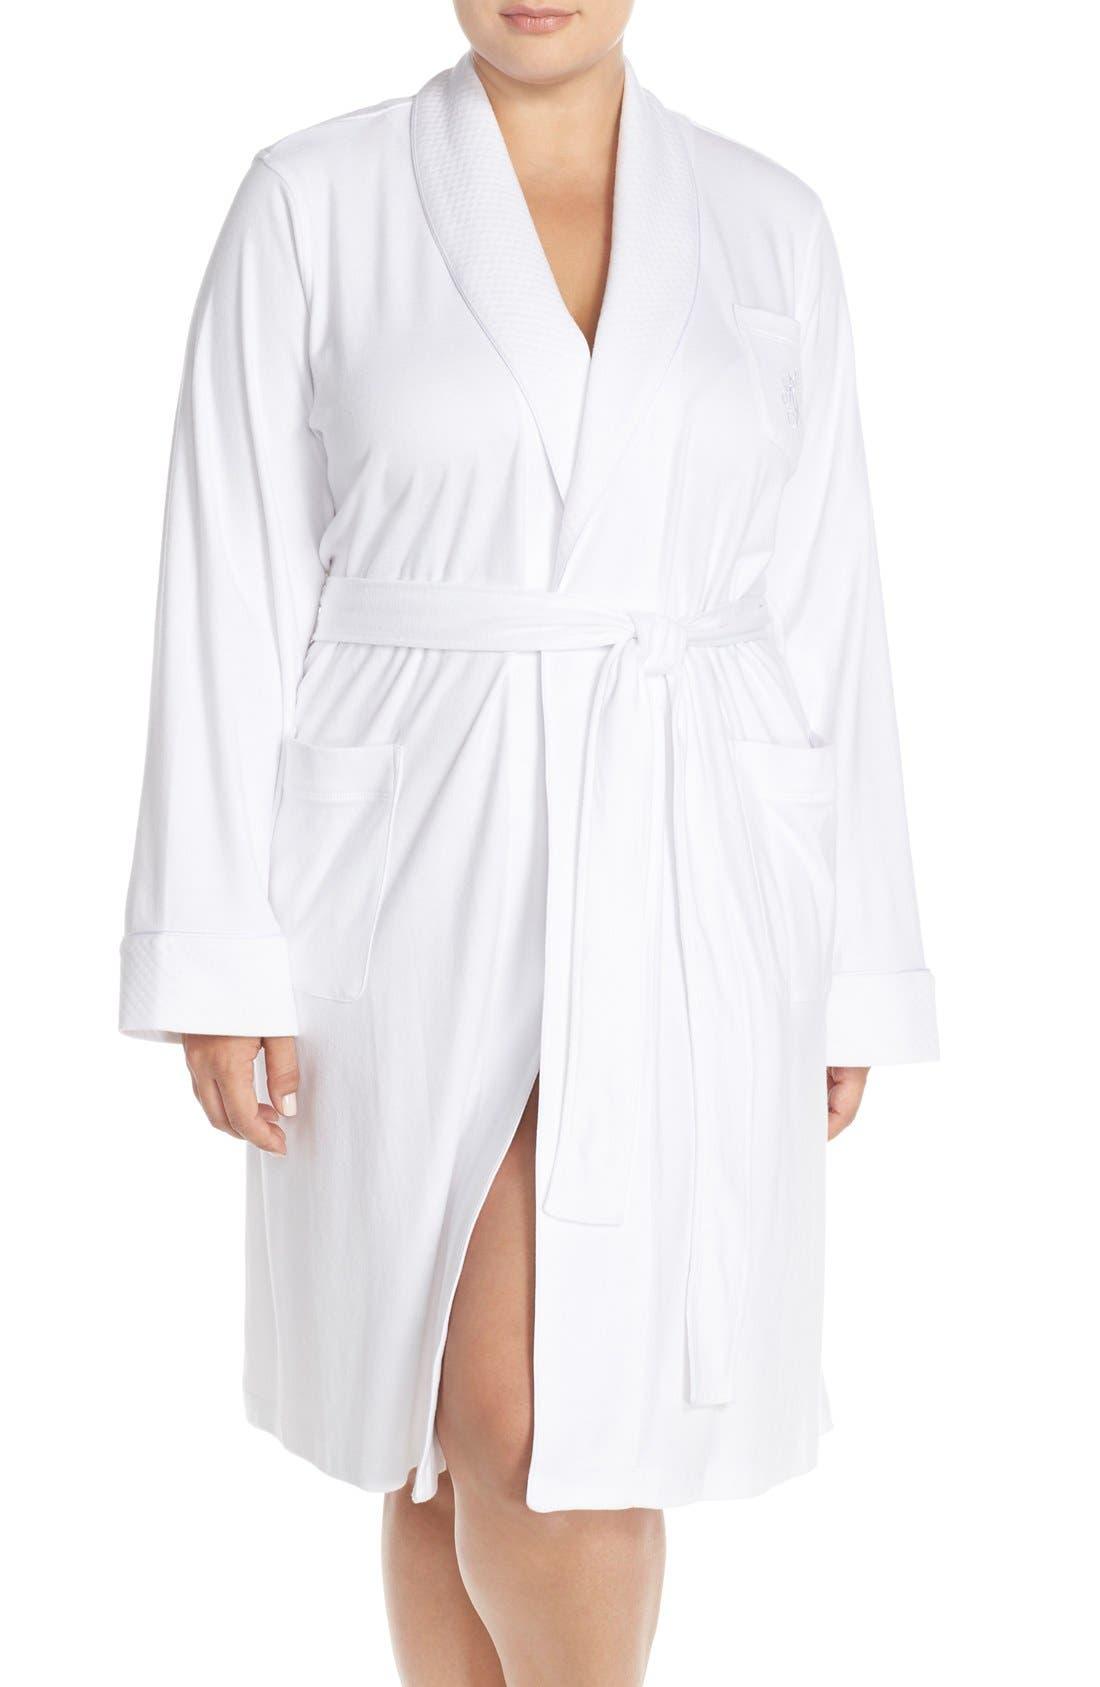 LAUREN RALPH LAUREN Shawl Collar Robe, Main, color, WHITE